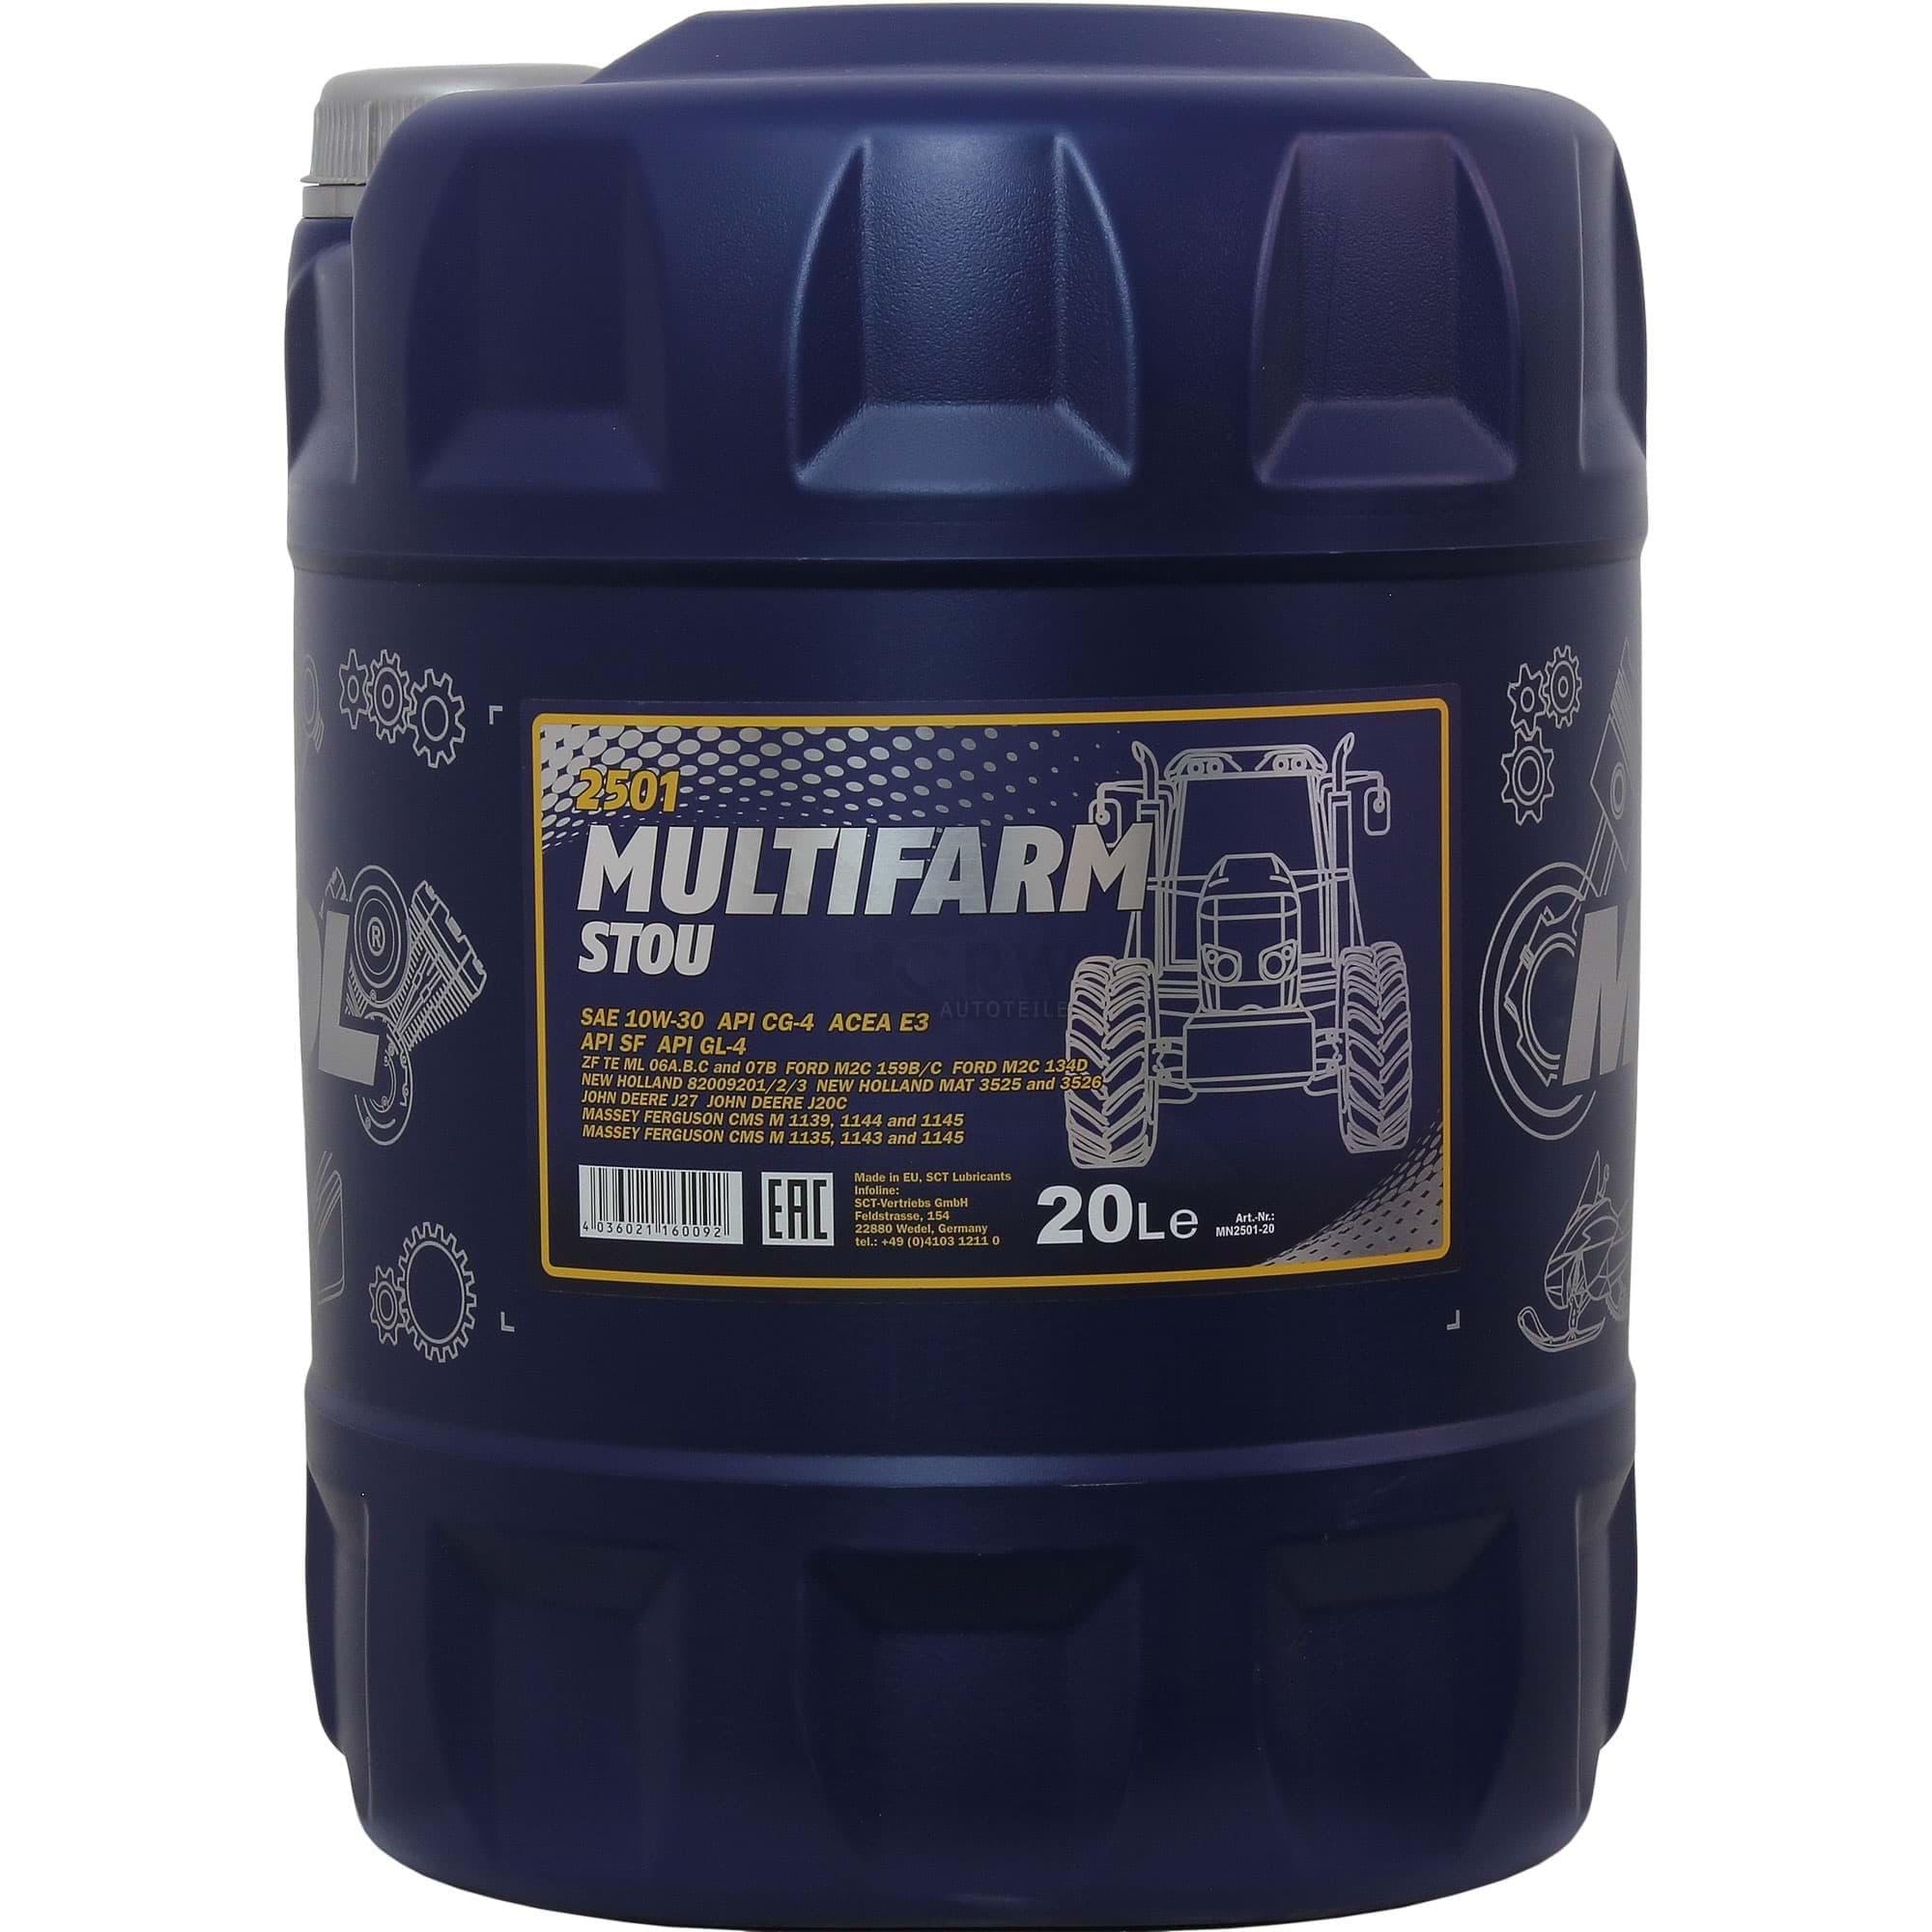 3x 20 Liter Mannol Motoröl Sae10w 30w Multifarm Stou Engine Oil öl